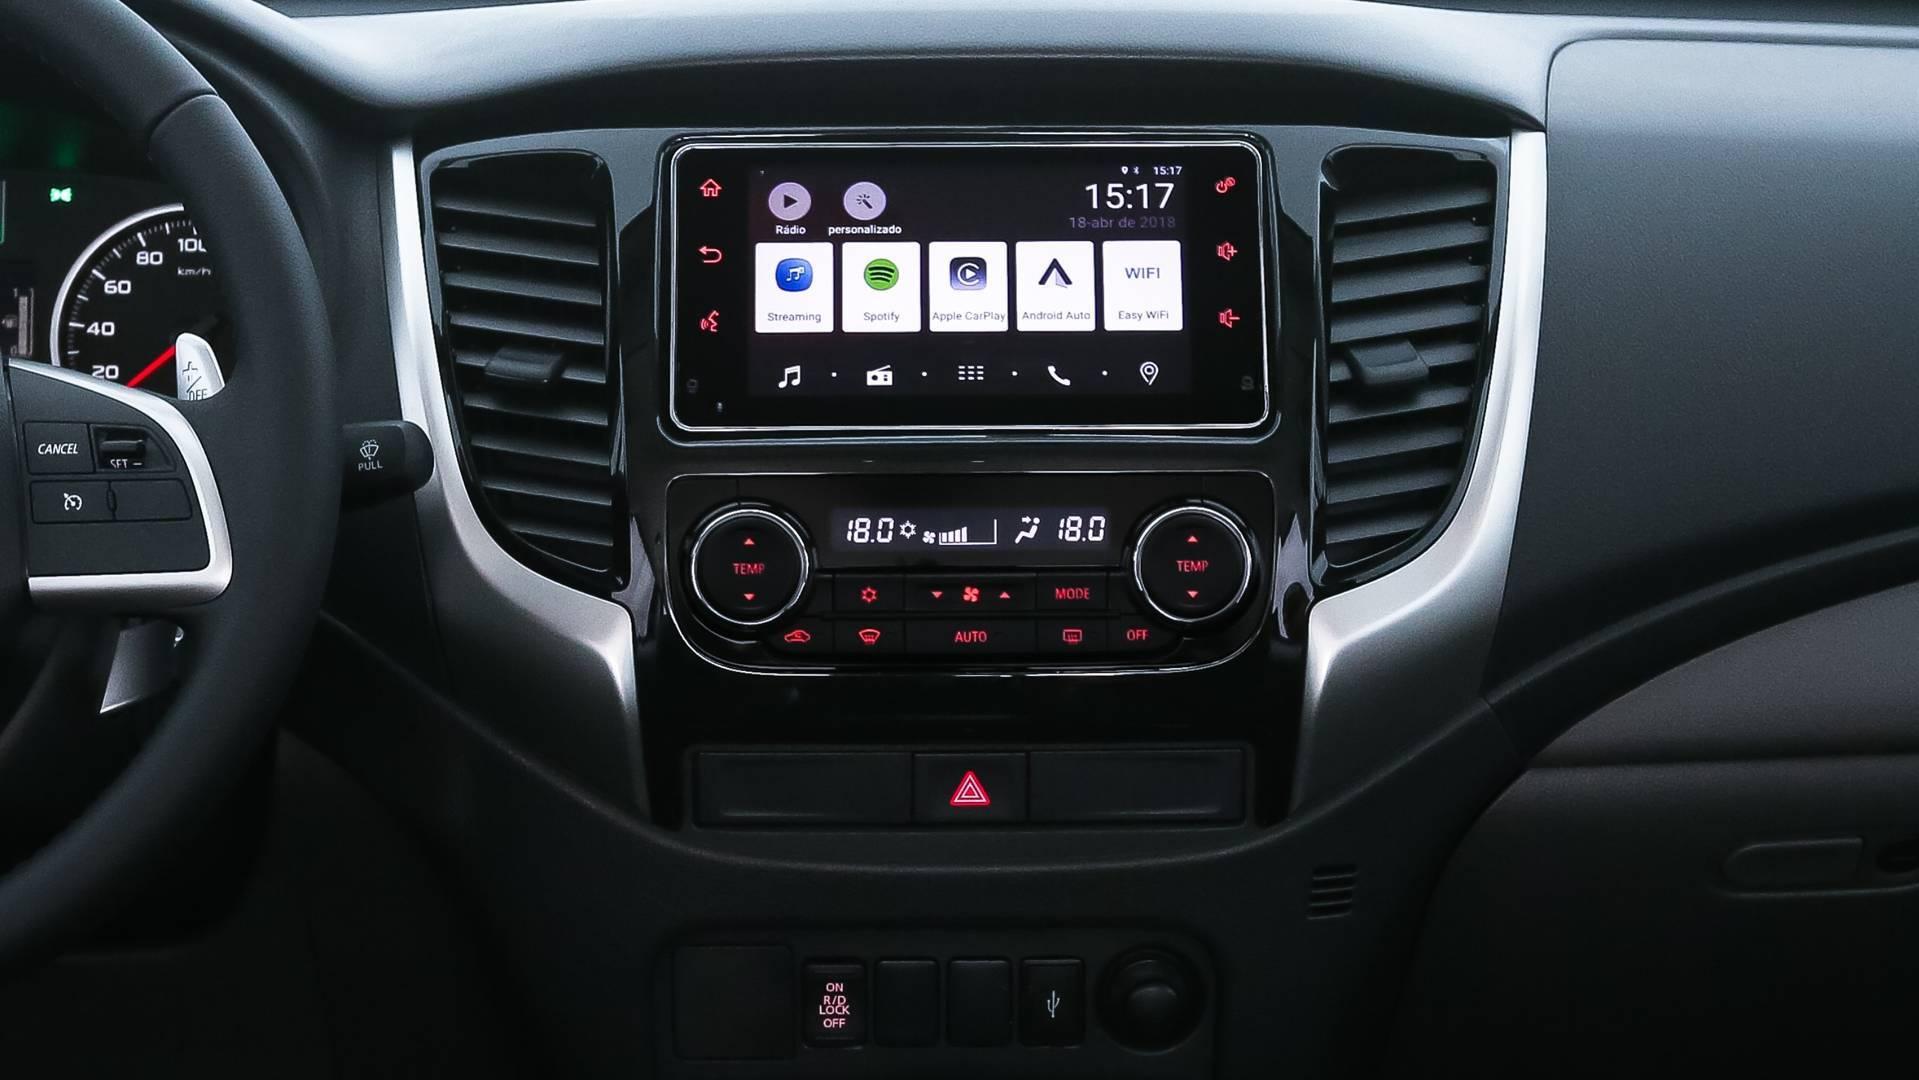 Mitsubishi L200 Triton Sport 2019. Foto: Divulgação